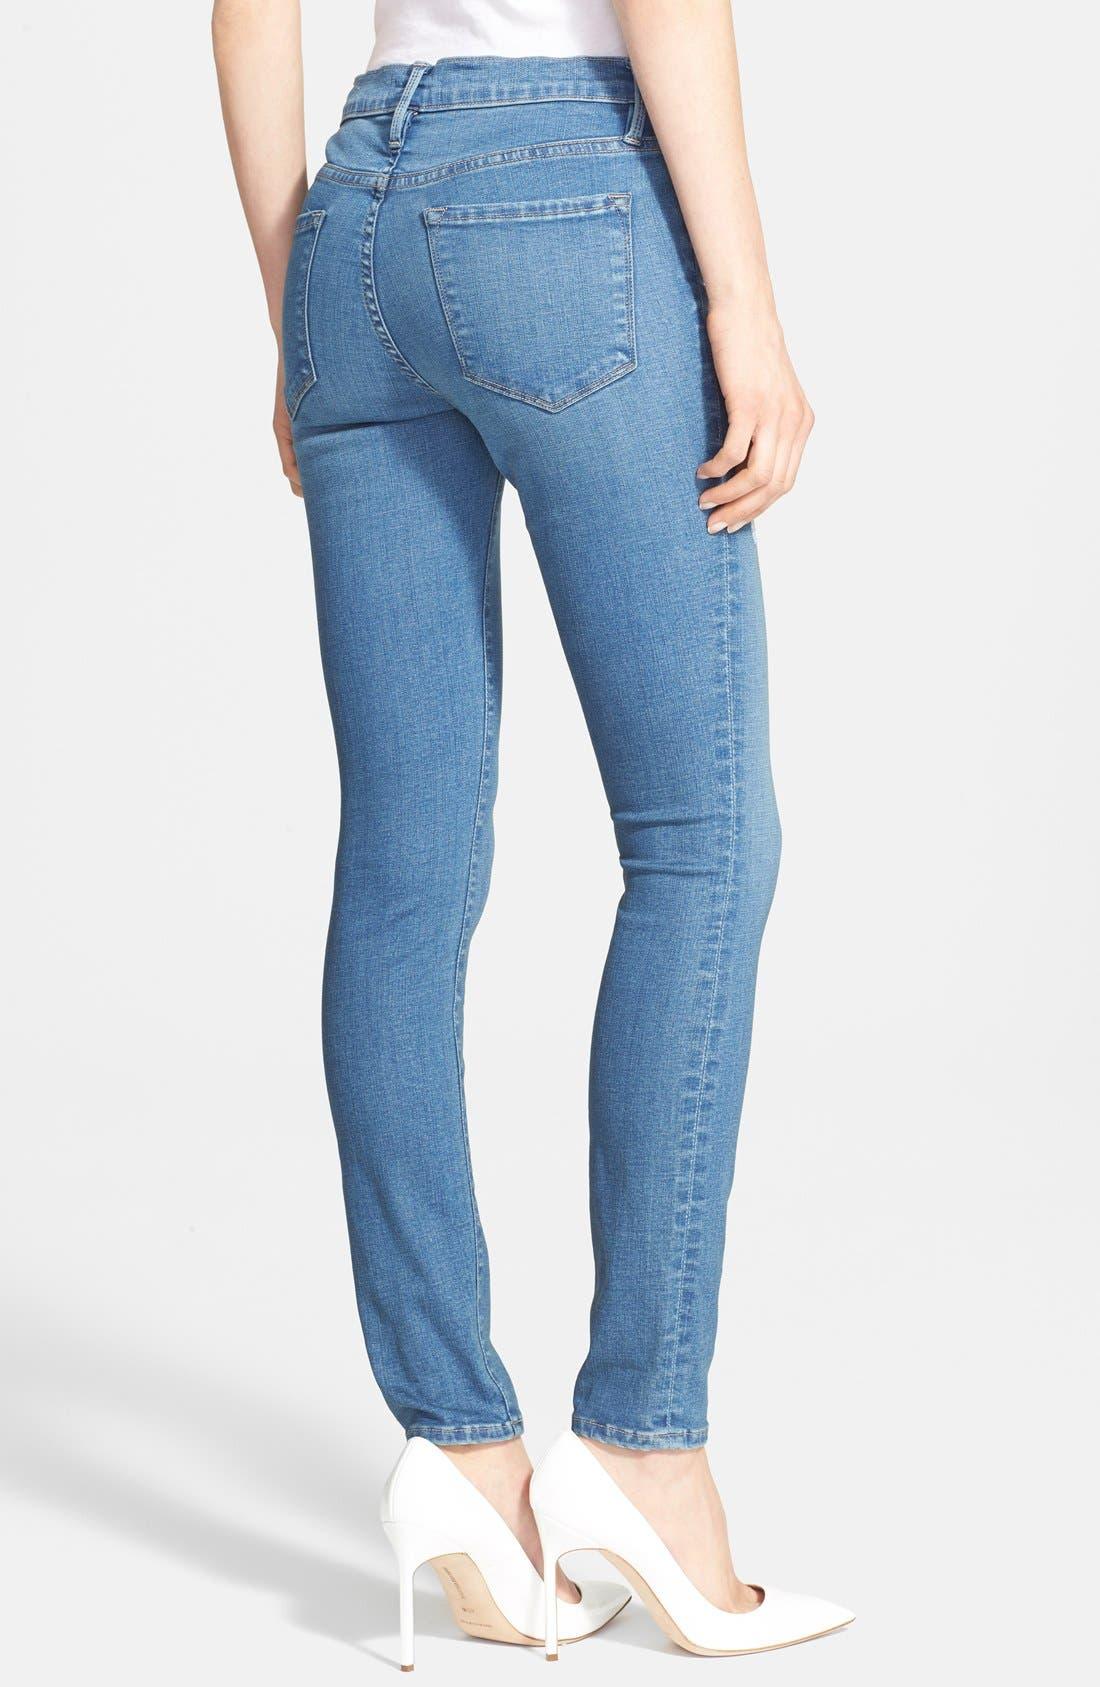 Alternate Image 2  - Frame Denim 'Le Skinny de Jeanne' Jeans (Alverstone) (Nordstrom Exclusive)